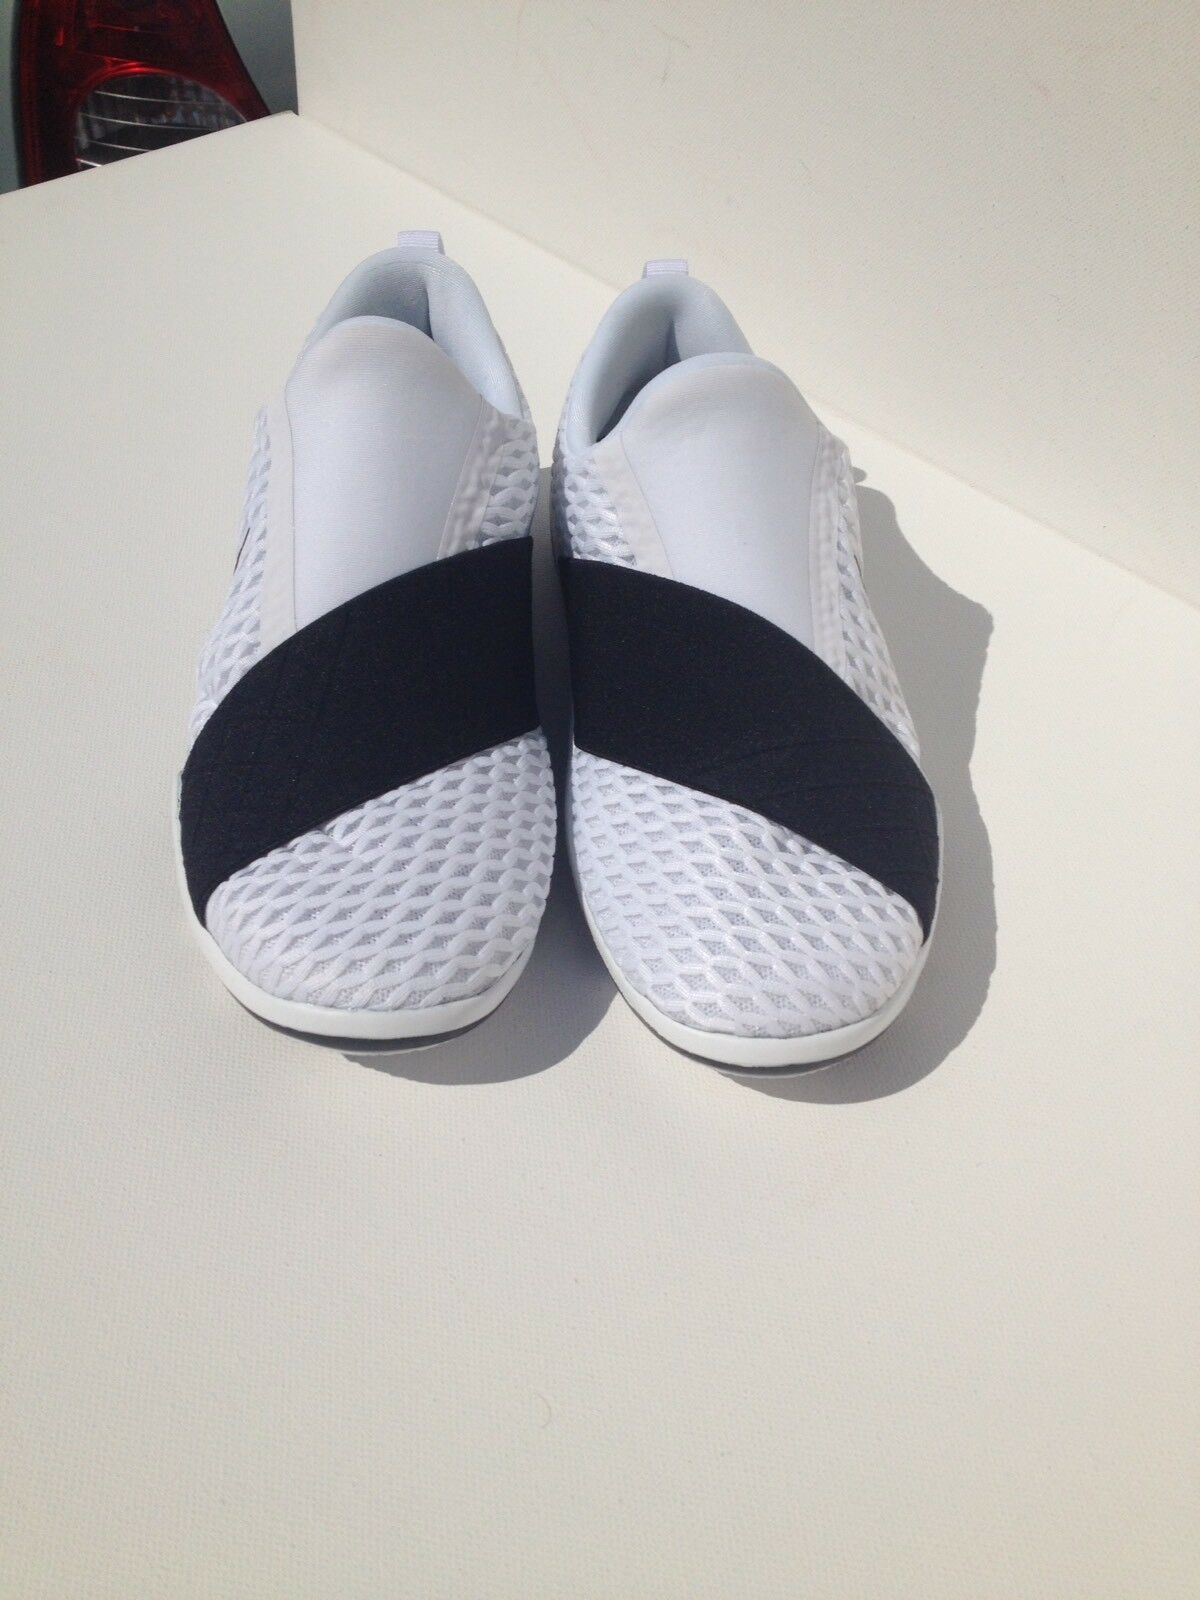 Nike Wo Hommes Free Noir Connect Uk 3.5 blanc  Noir Free 843966100 47ae55